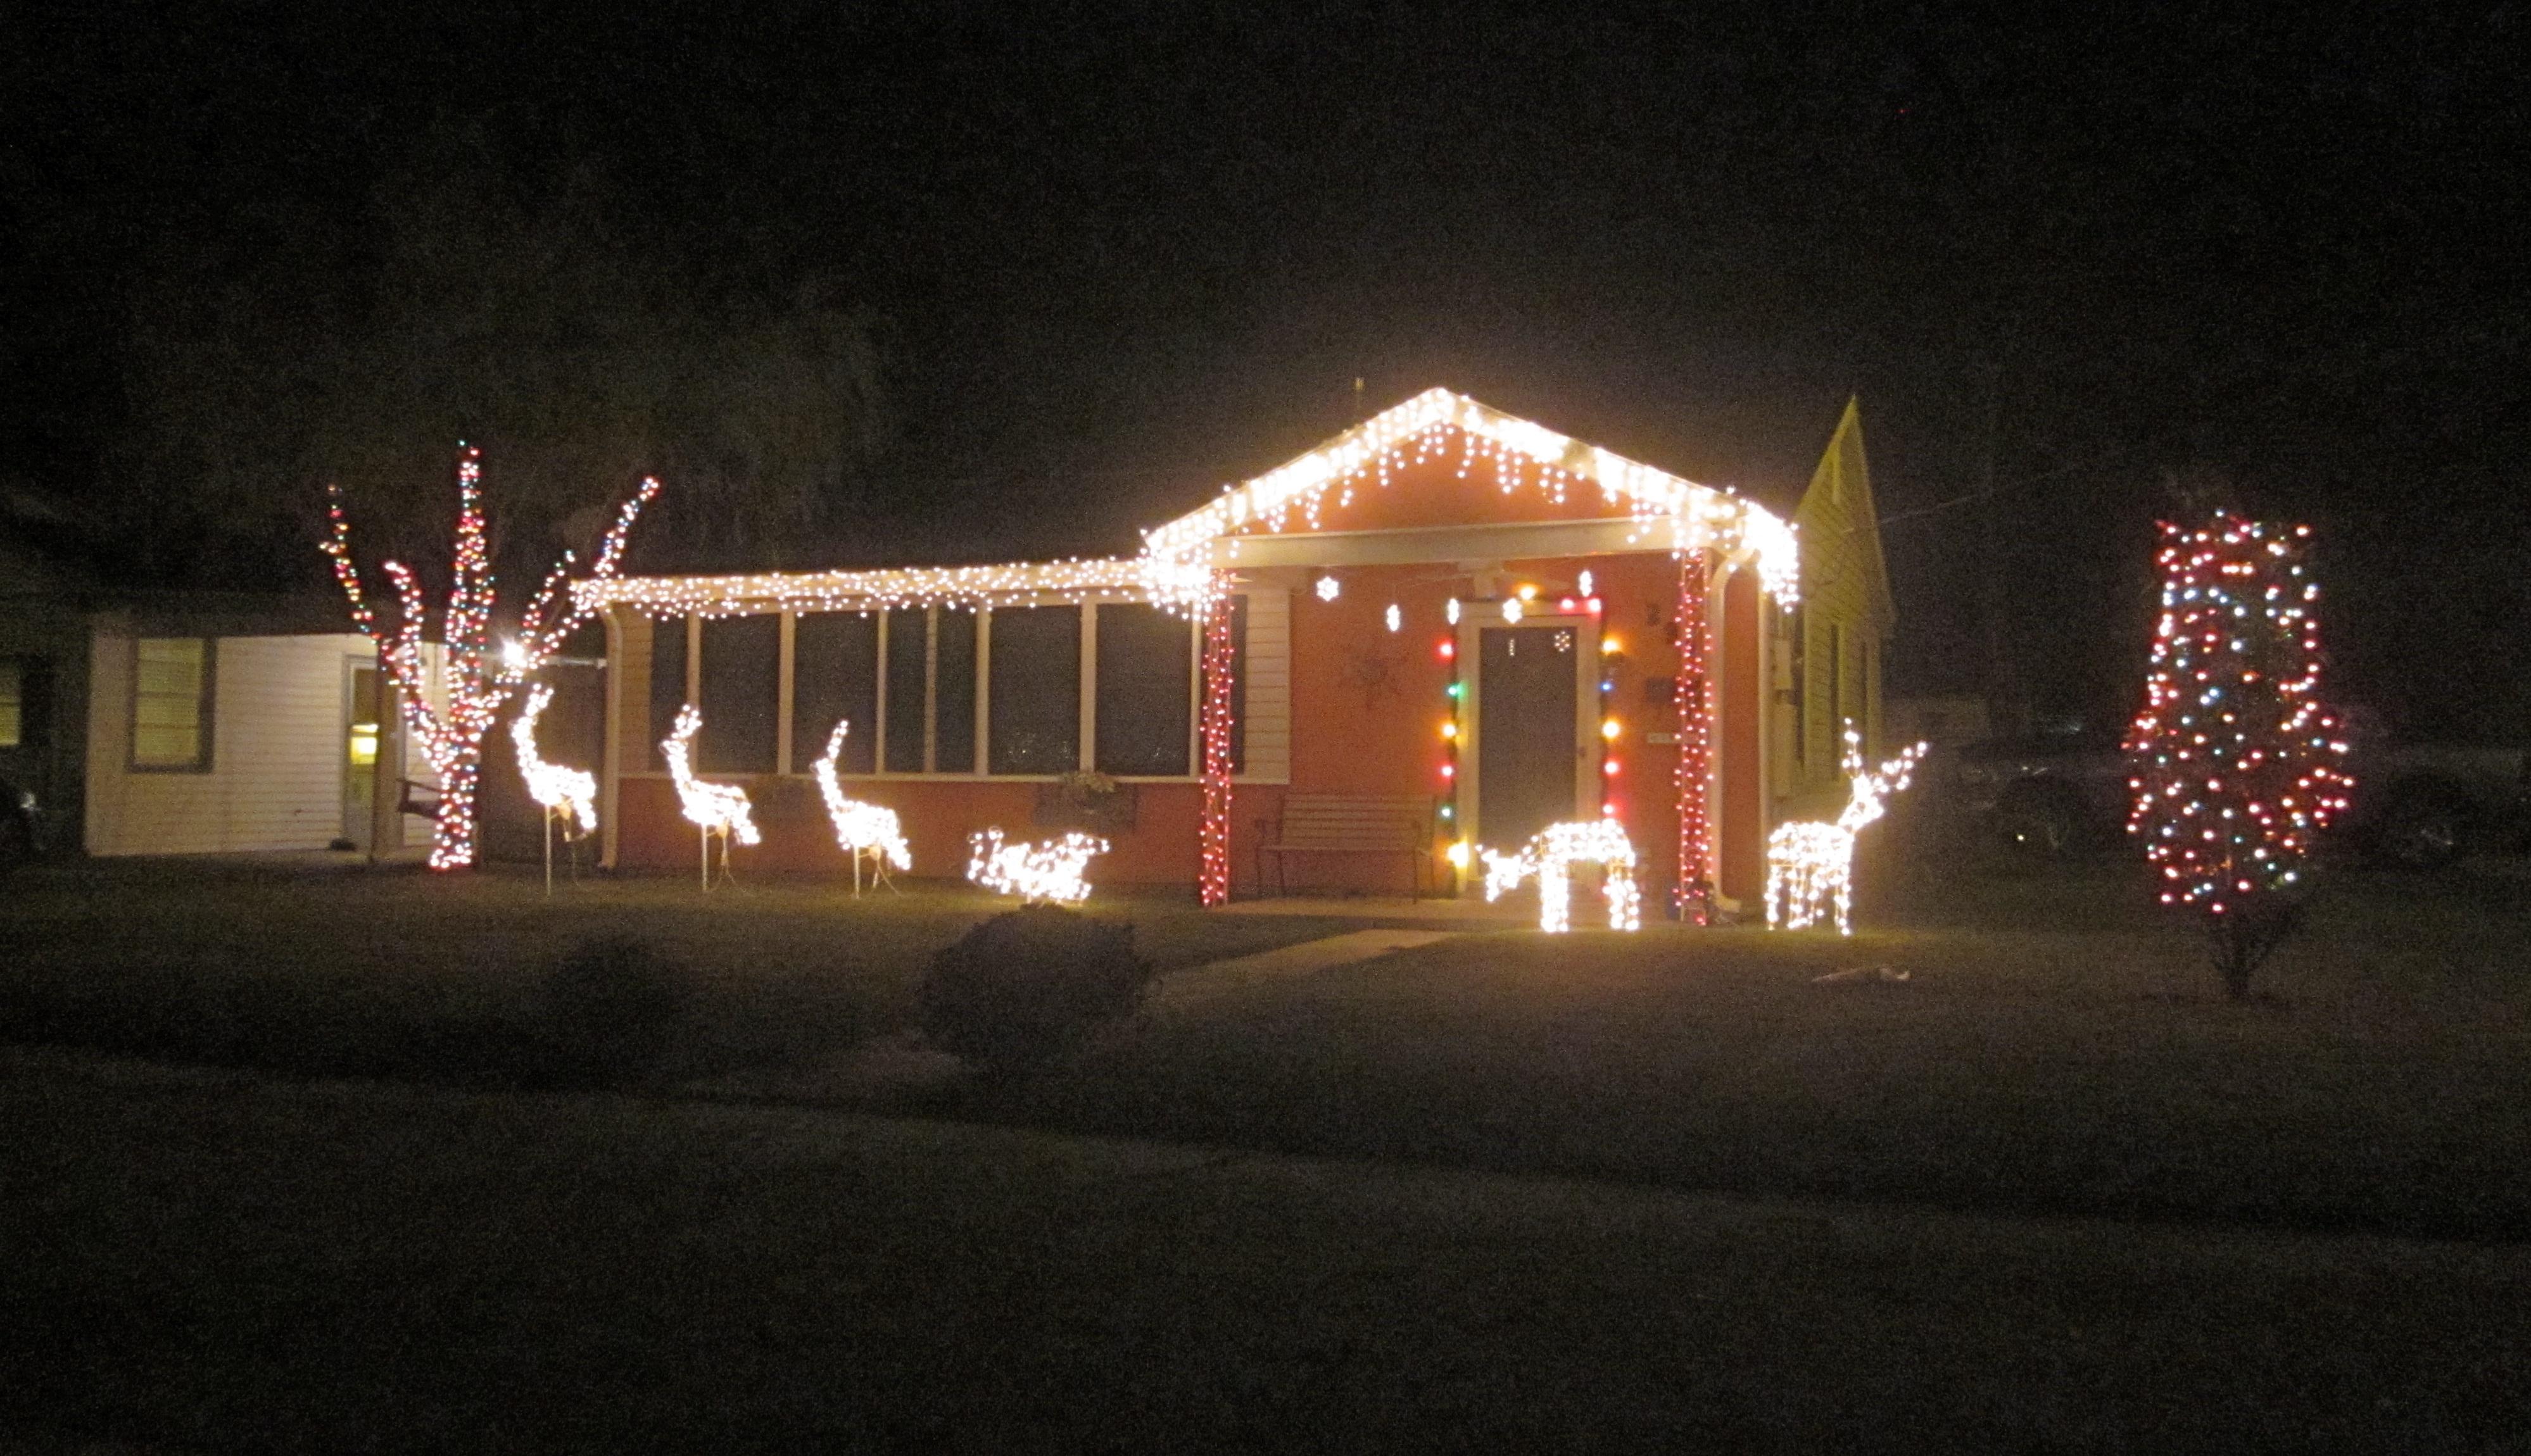 File:Harrahan Christmas Lights House 1.JPG